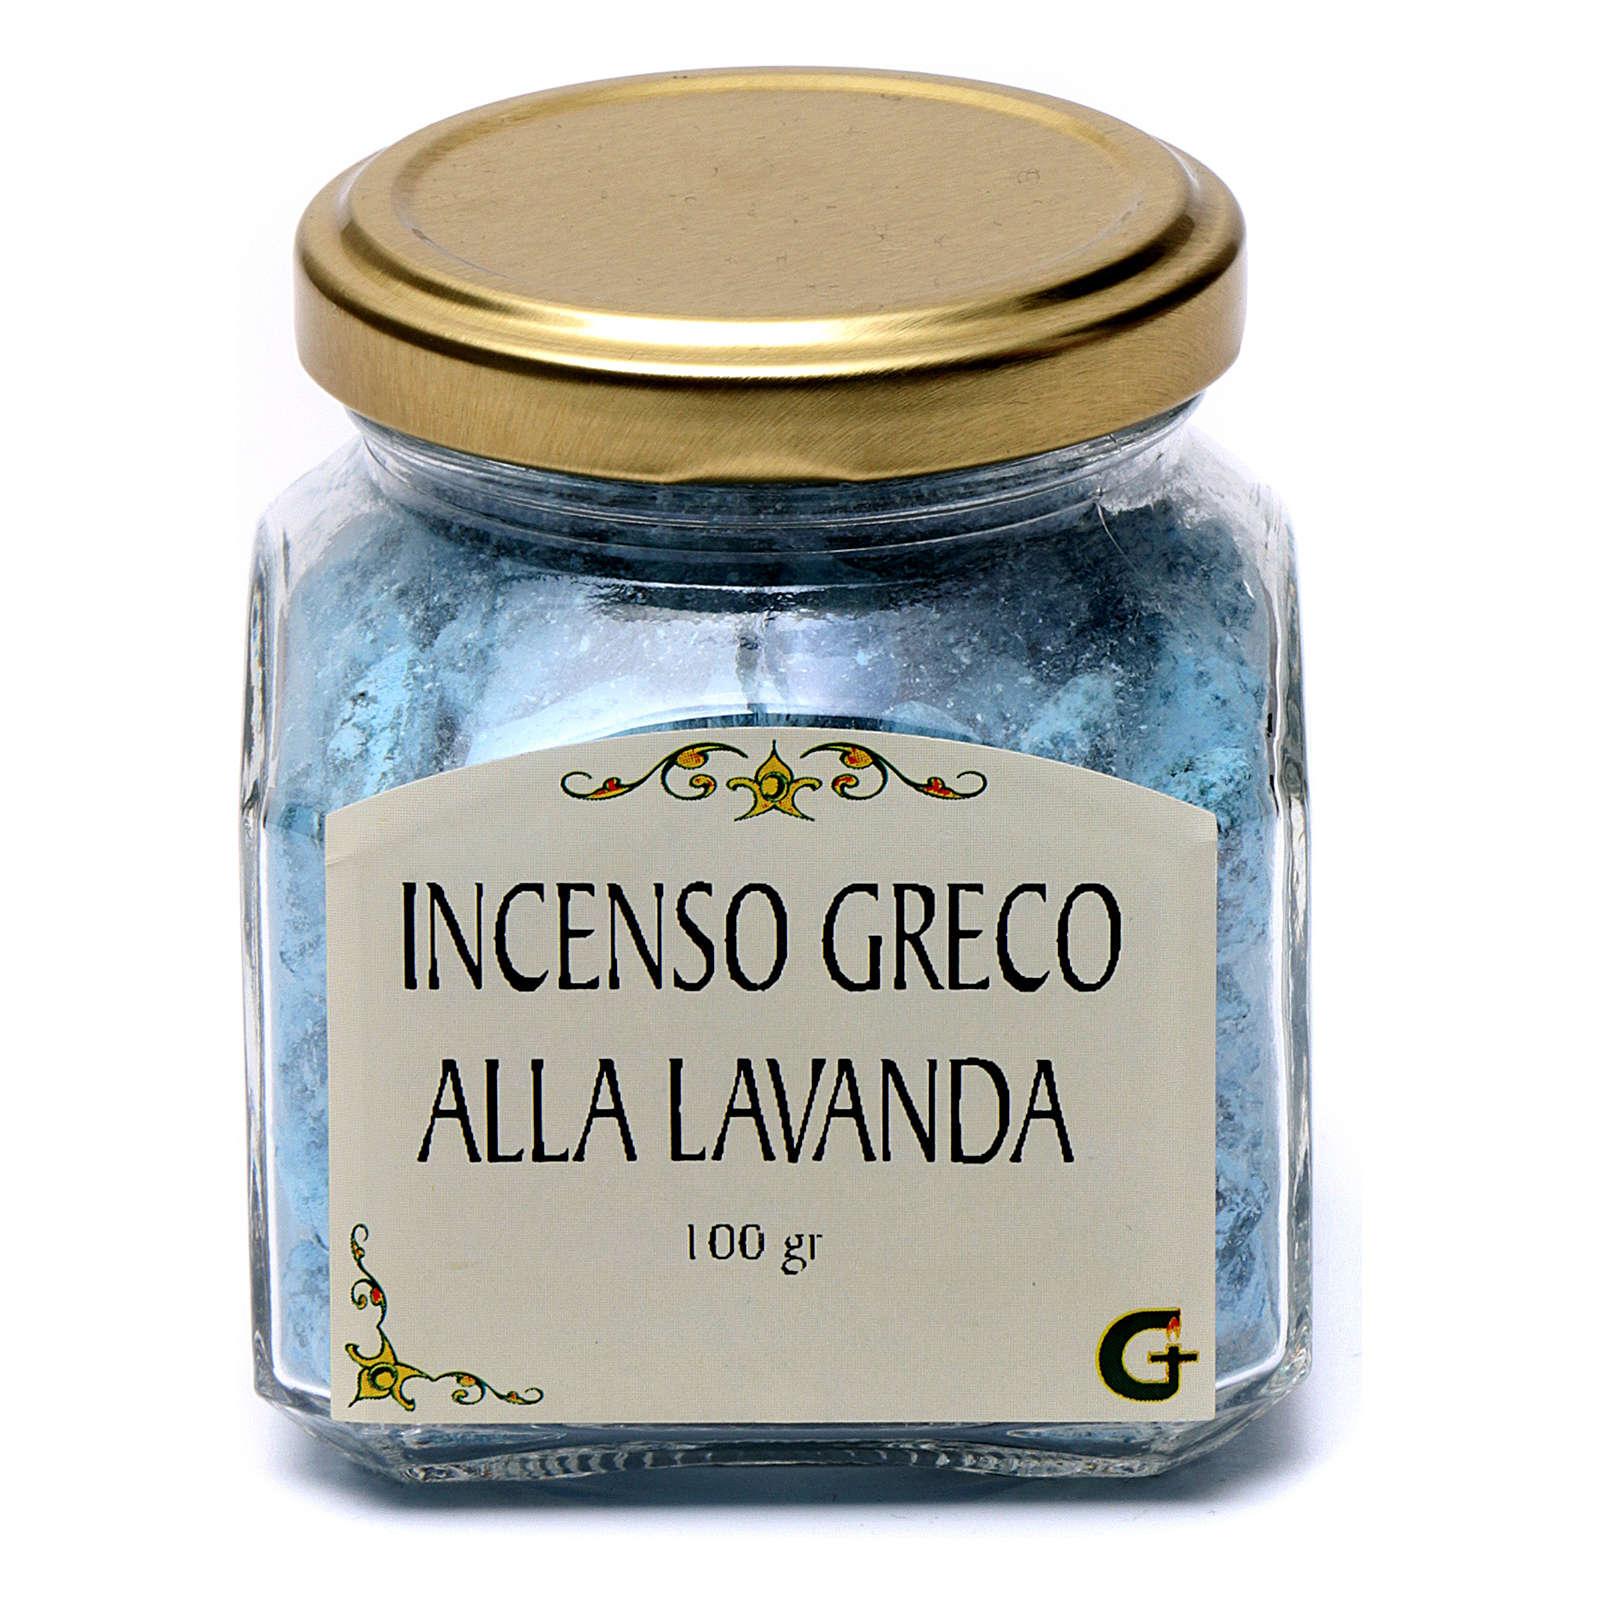 Incenso greco alla lavanda 100 gr Monte Athos 3